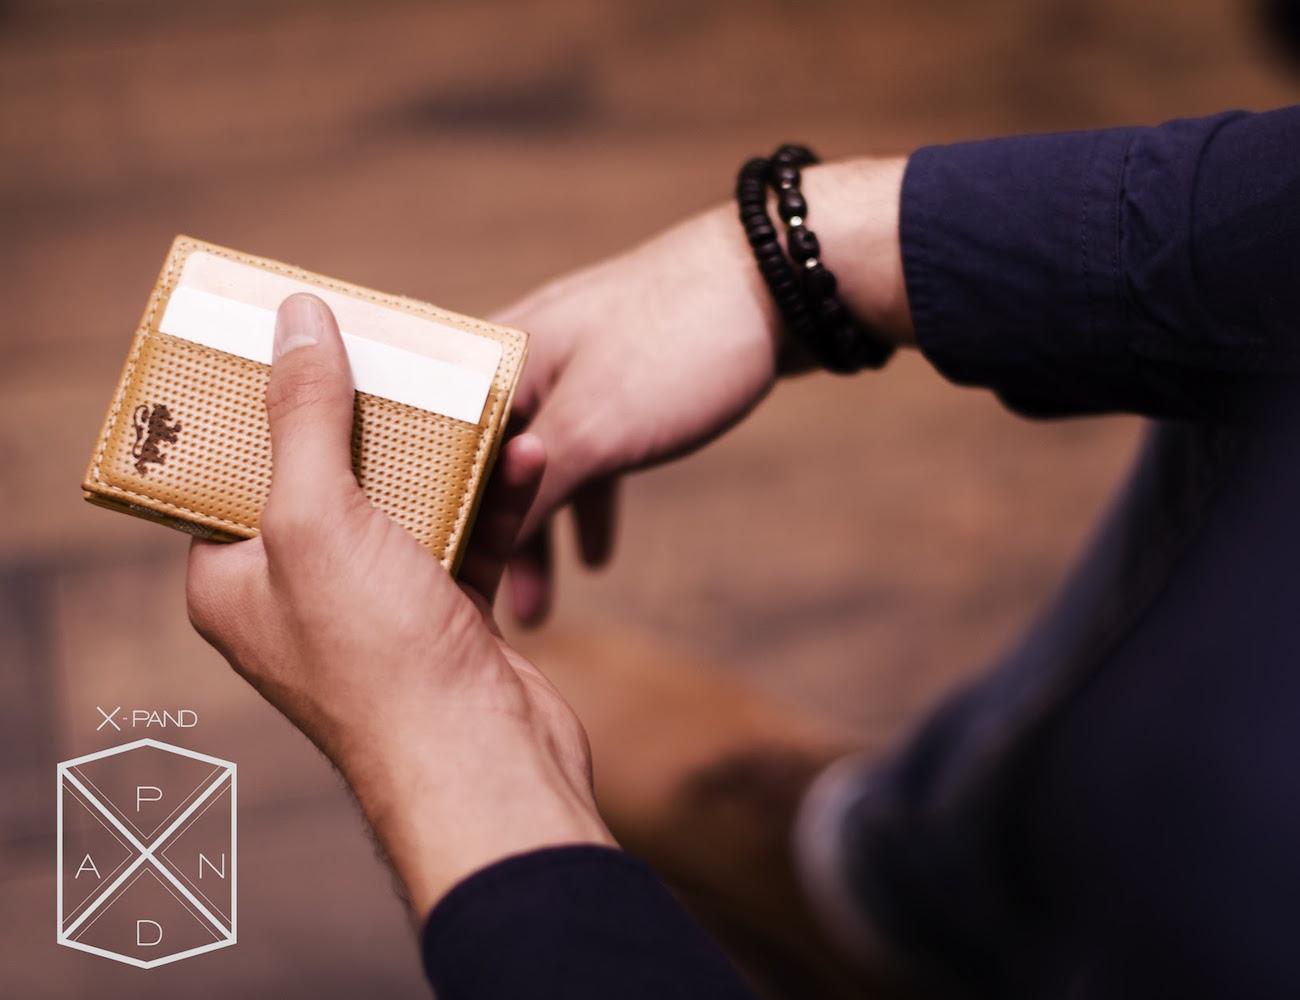 XPAND – The Magic Wallet